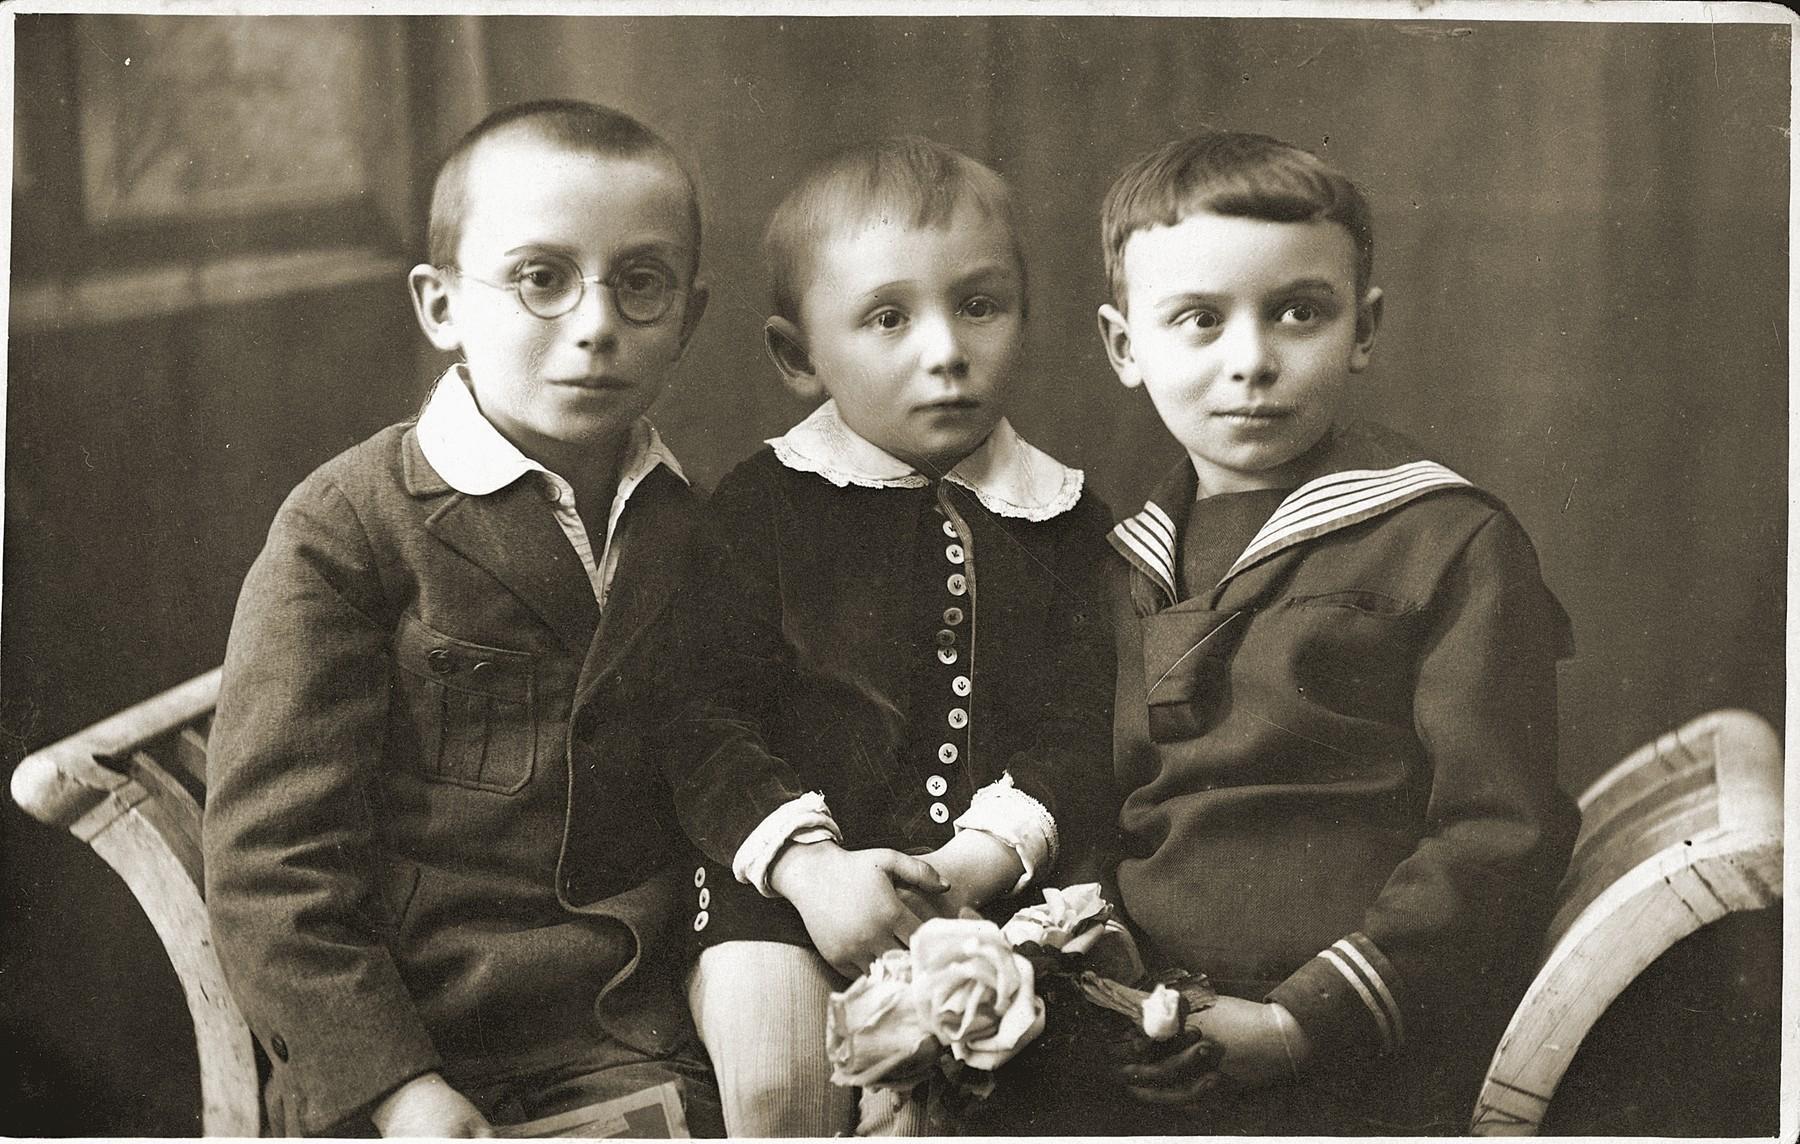 Portrait of Lolek, Yejik and Mancha Muszynski.